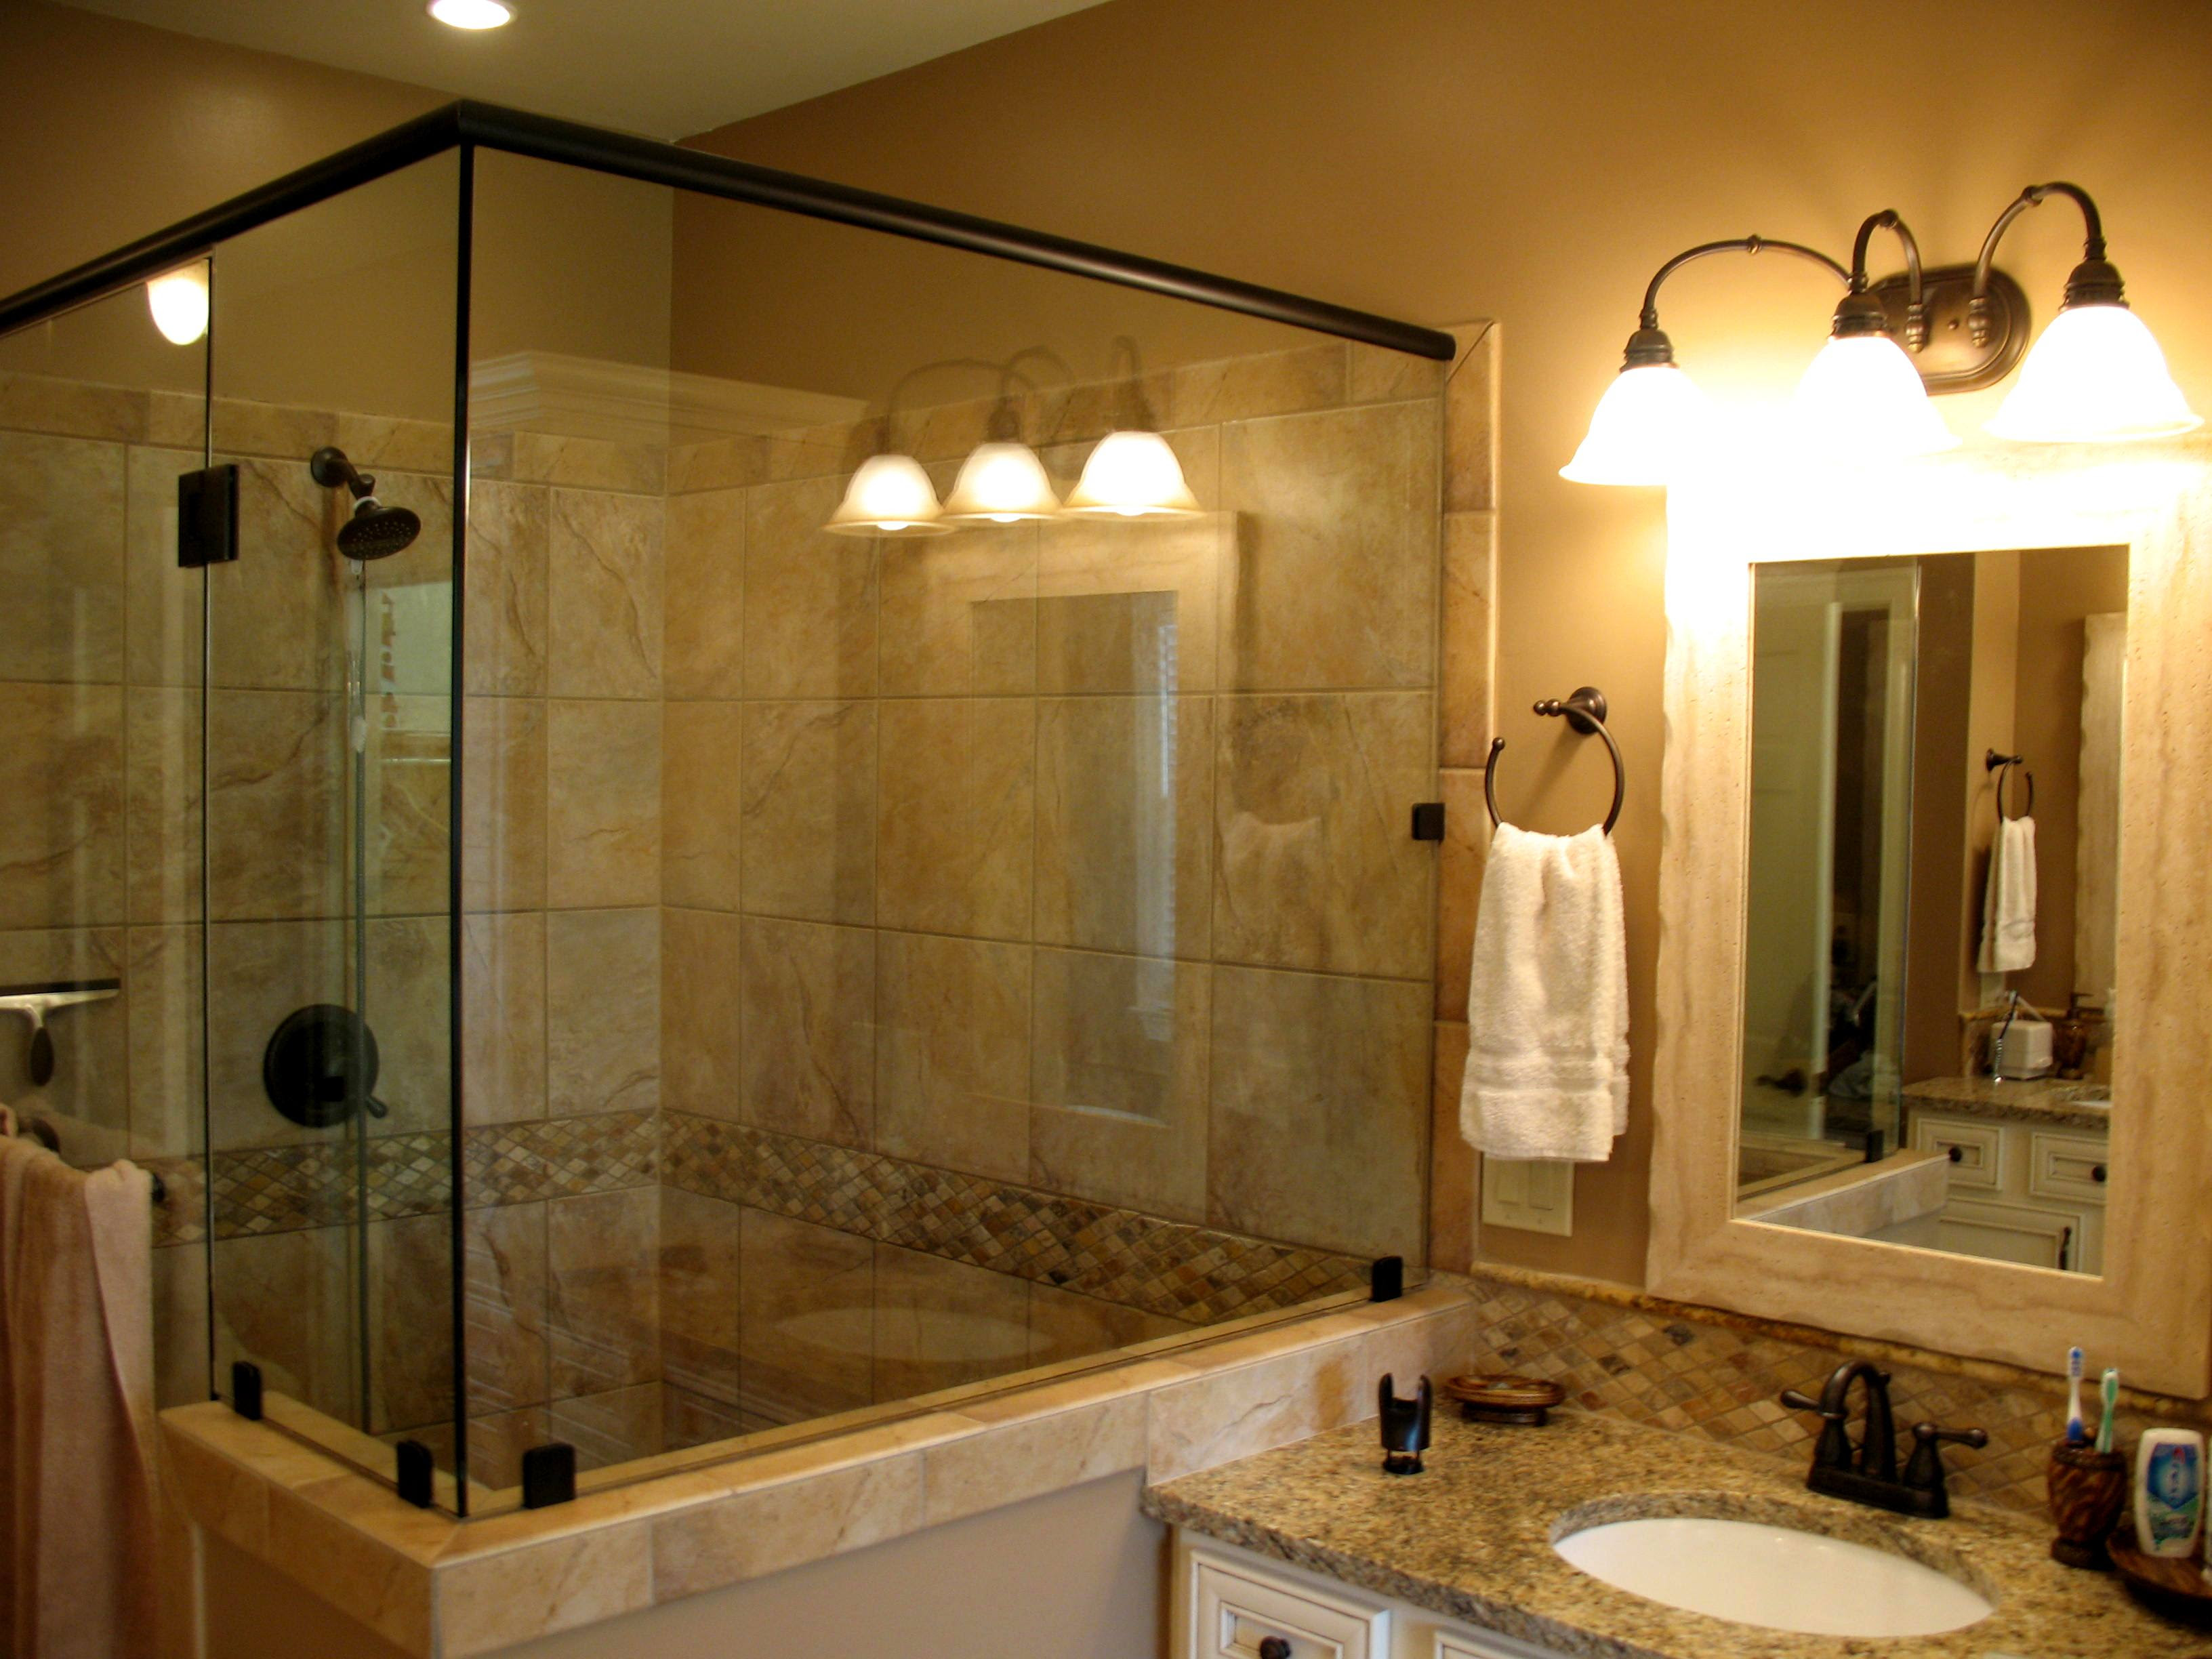 Magnificent Small Master Bathroom Remodeling Ideas 3264 x 2448 · 551 kB · jpeg